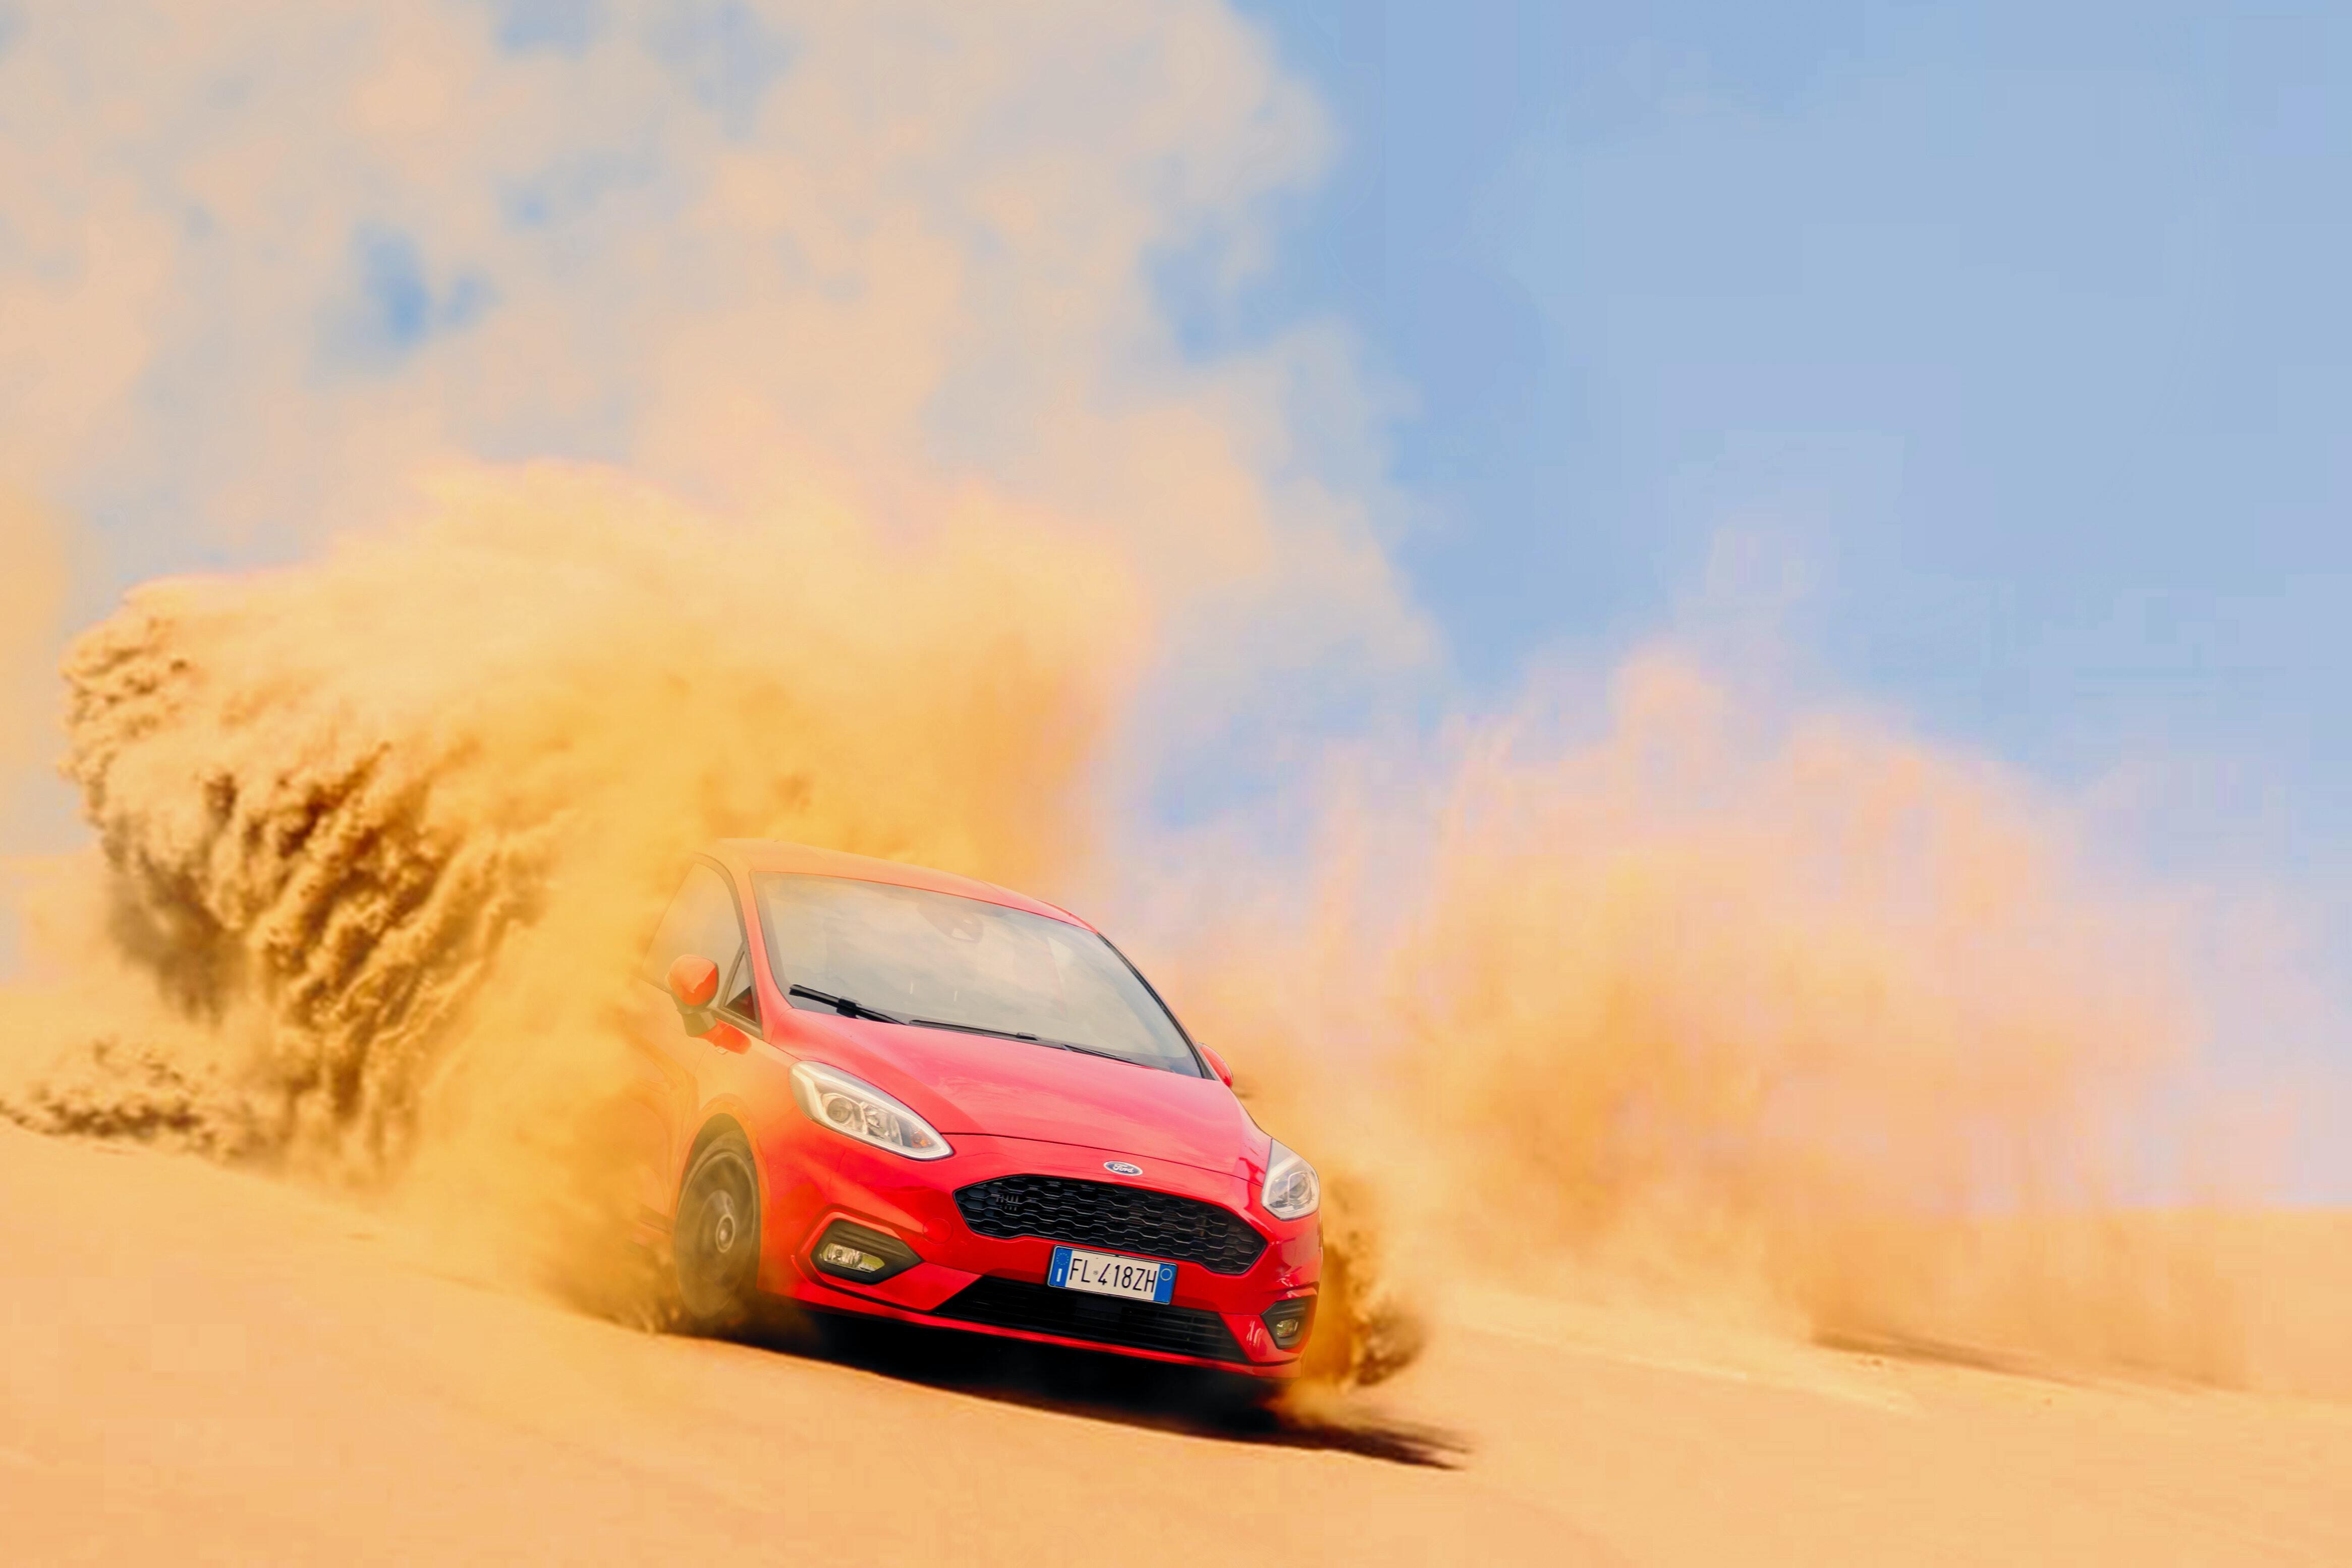 Картинка: Ford, автомобиль, песок, пыль, дрифт, буксы, дымка